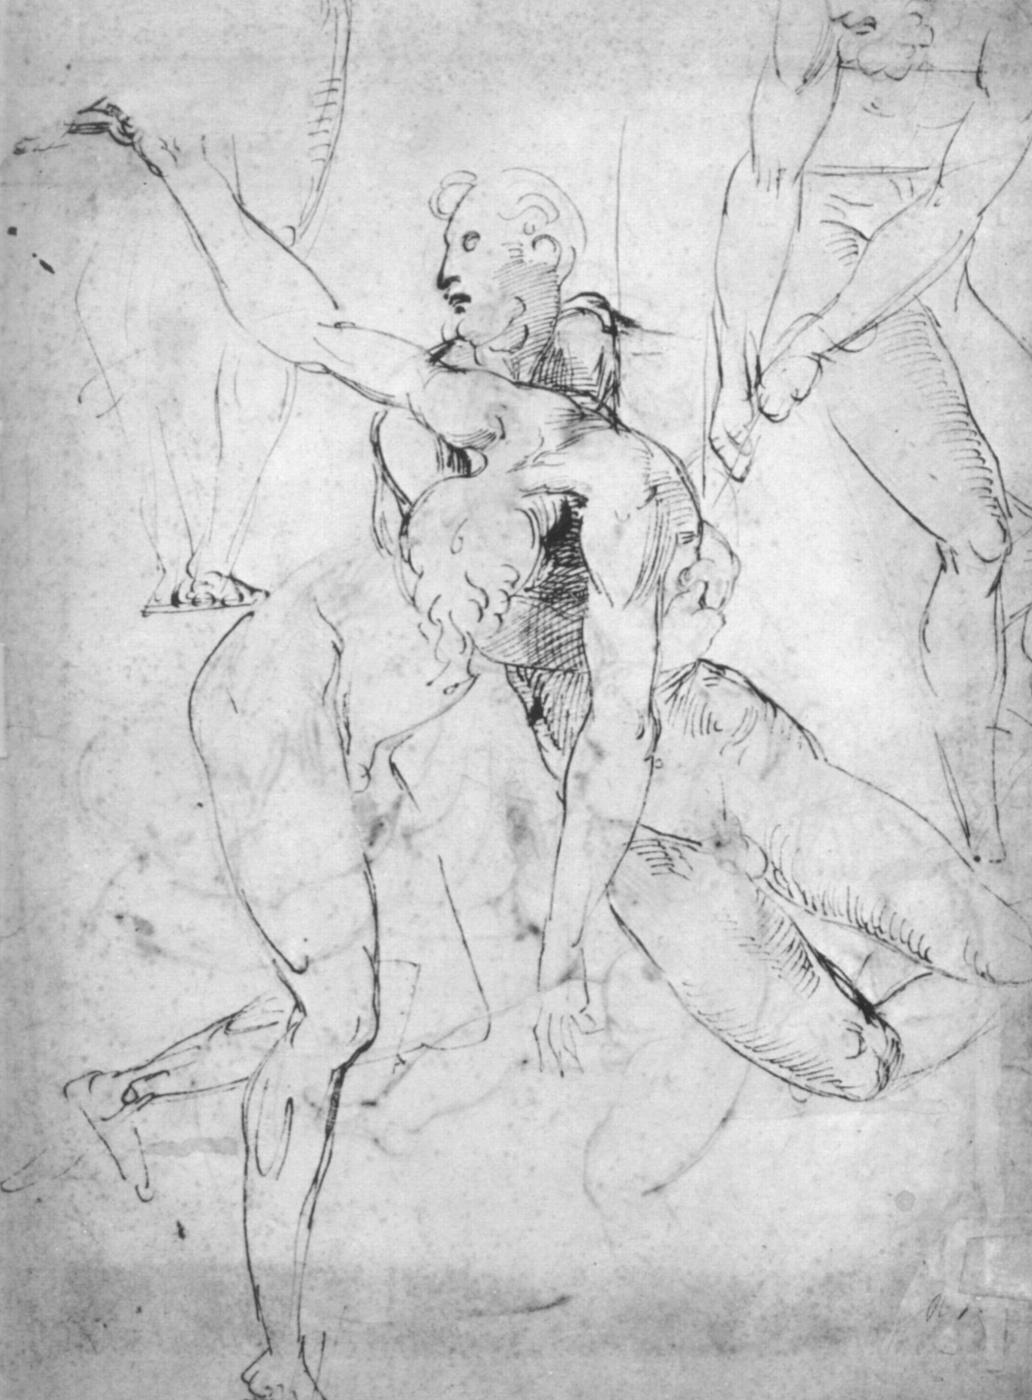 Raphael Sanzio. Sketch of Nude male figures for the battle scenes